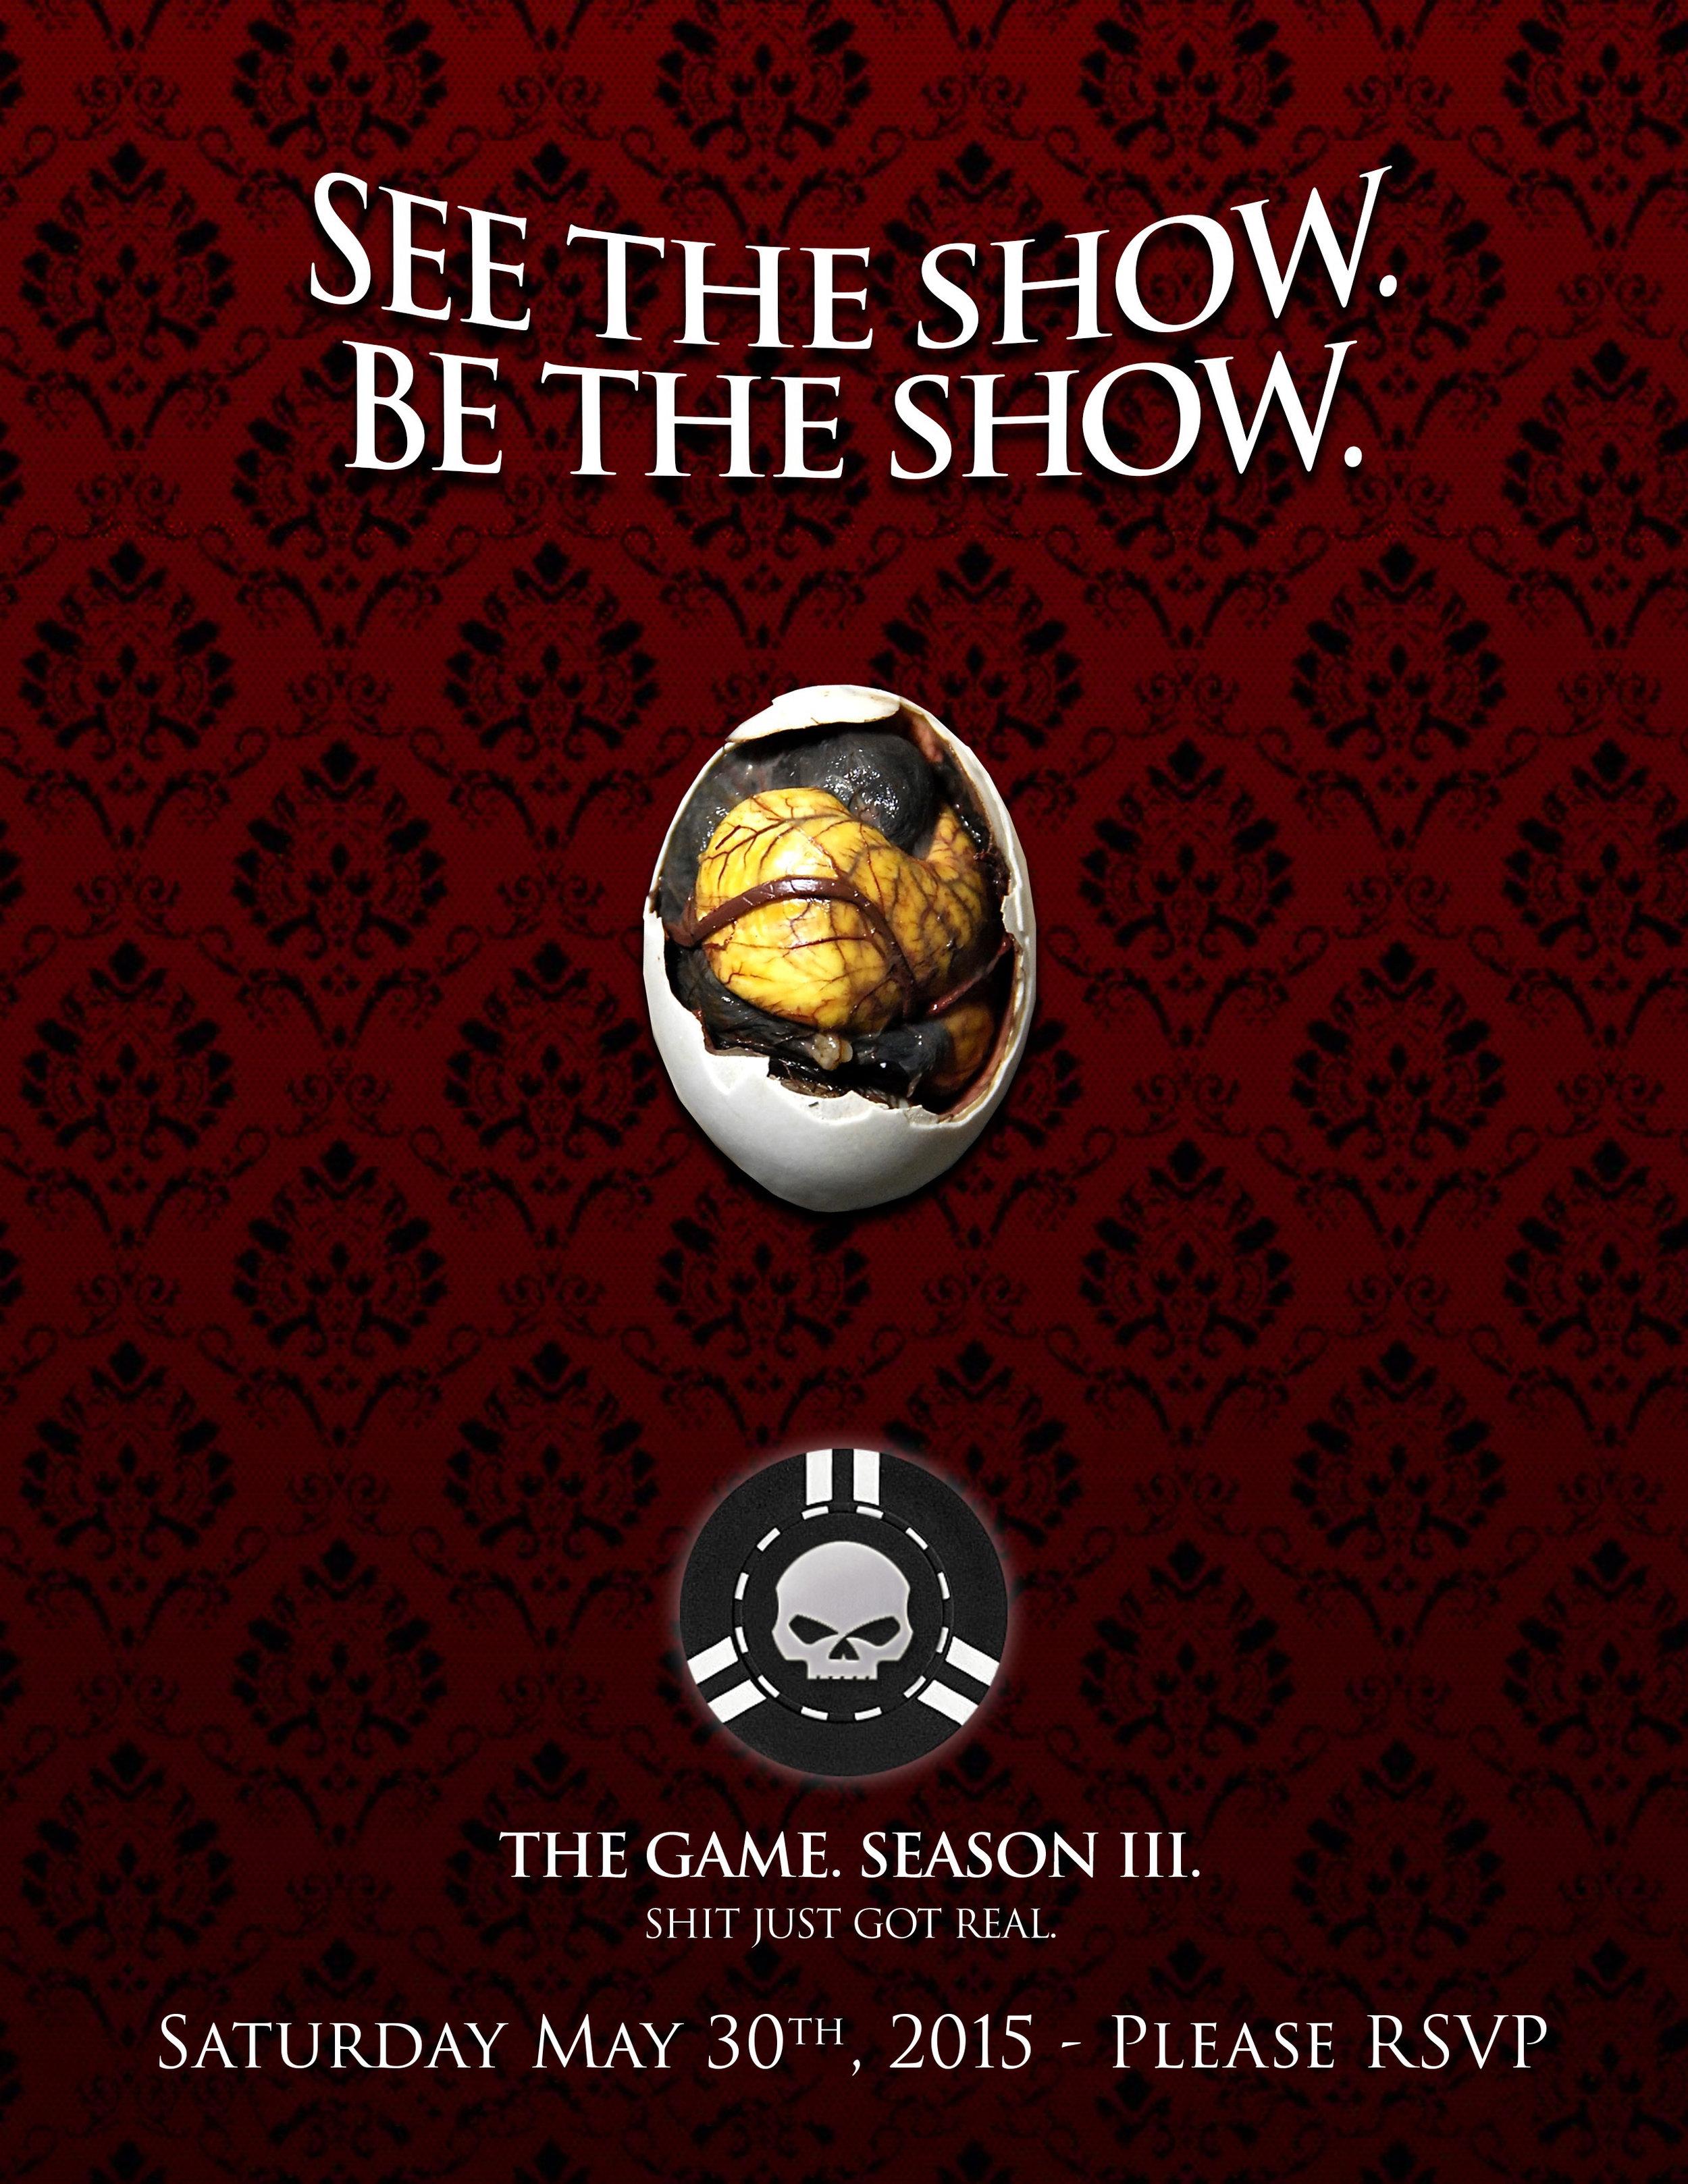 SchneLs Game Season Three Balut.jpg